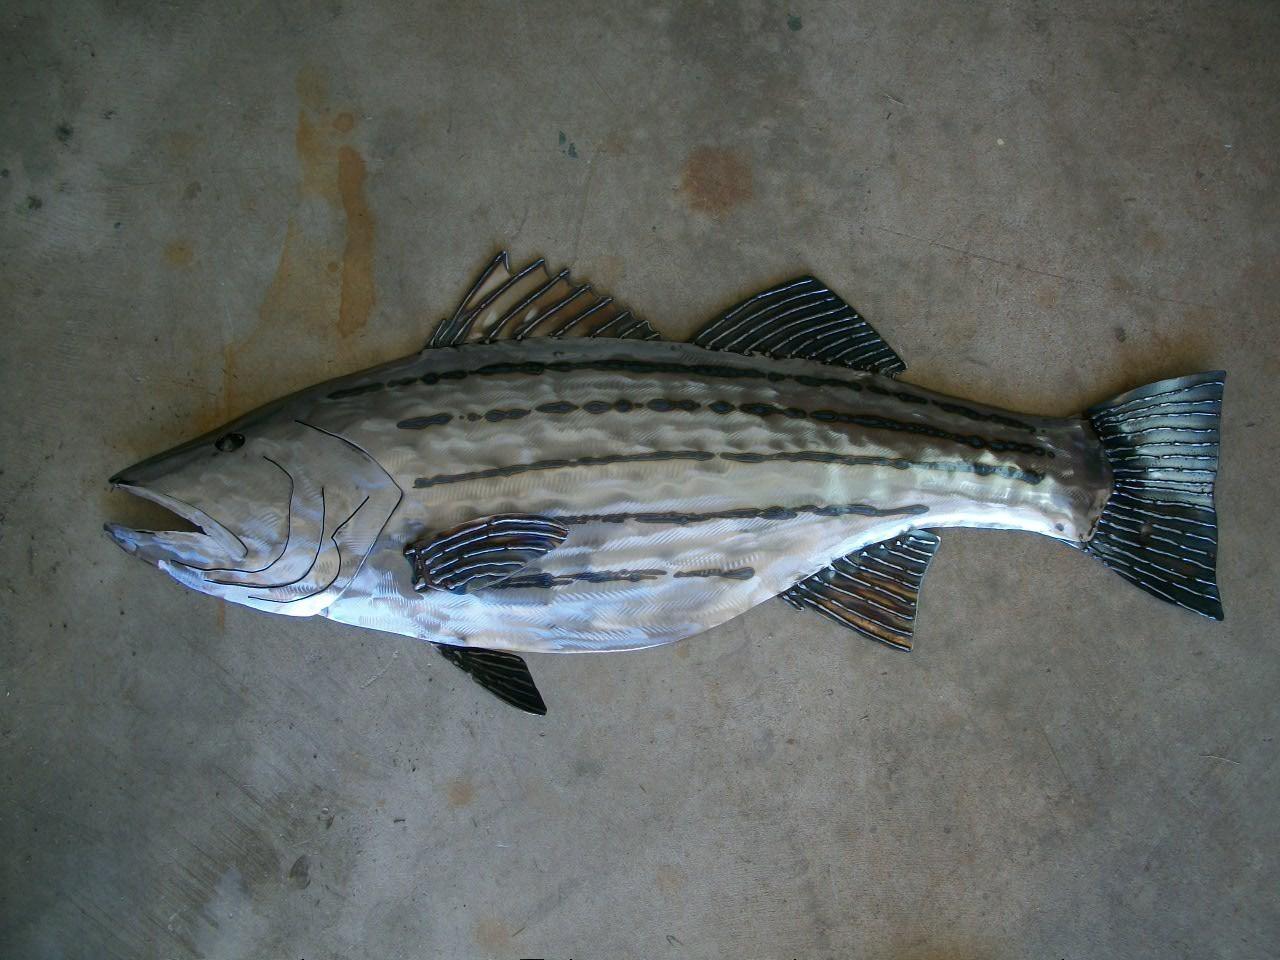 Metal Wall Art Fish   Wallartideas Pertaining To Fish Shoal Metal Wall Art (Image 11 of 20)